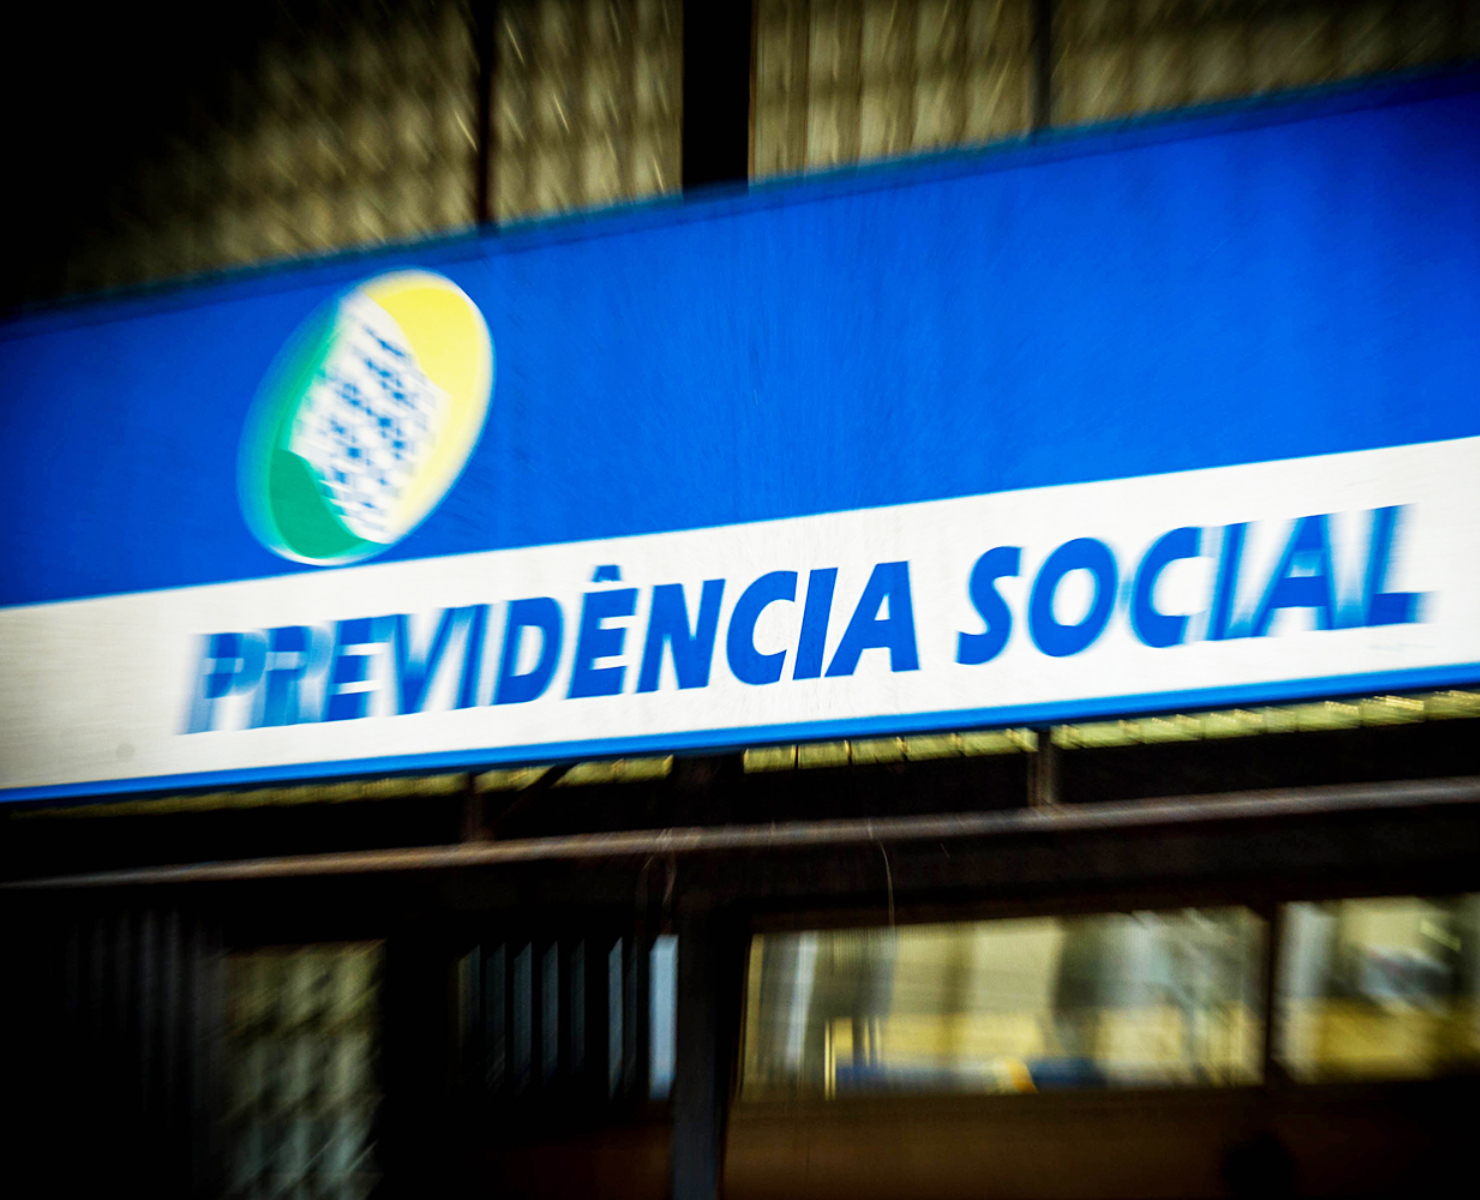 PREVIDÊNCIA: SENADO DEBATE TEXTO DA REFORMA